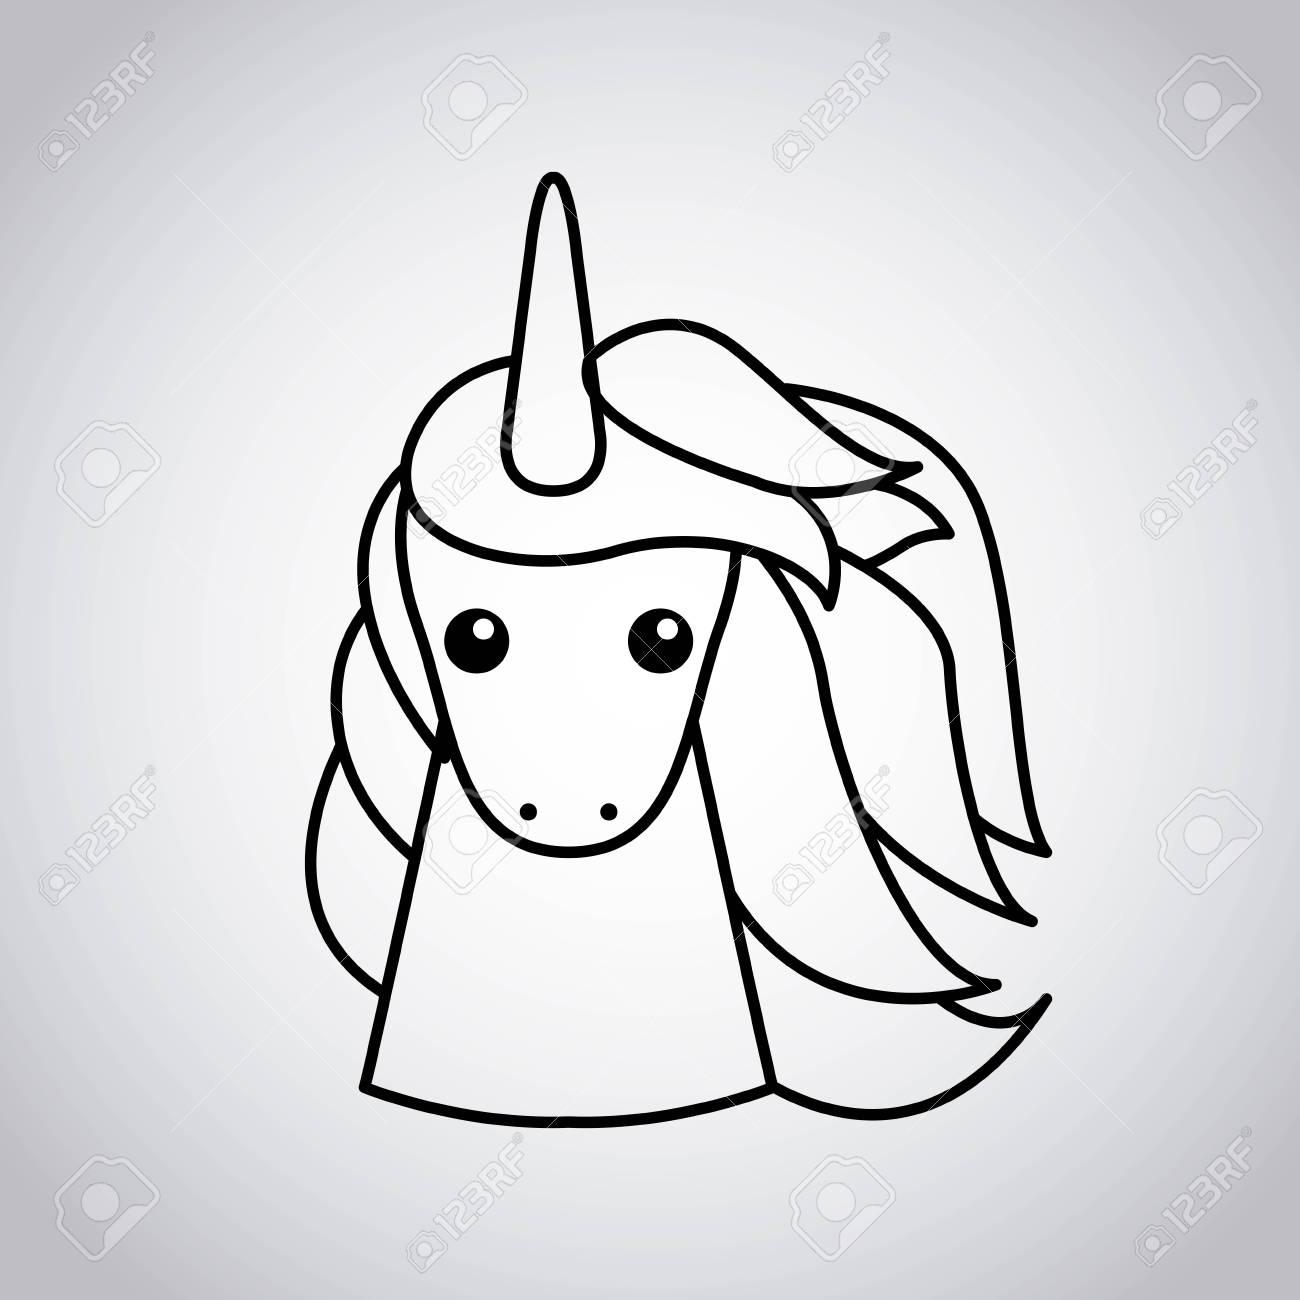 Drawing Cute Unicorn Icon Vector Illustration Design Stock